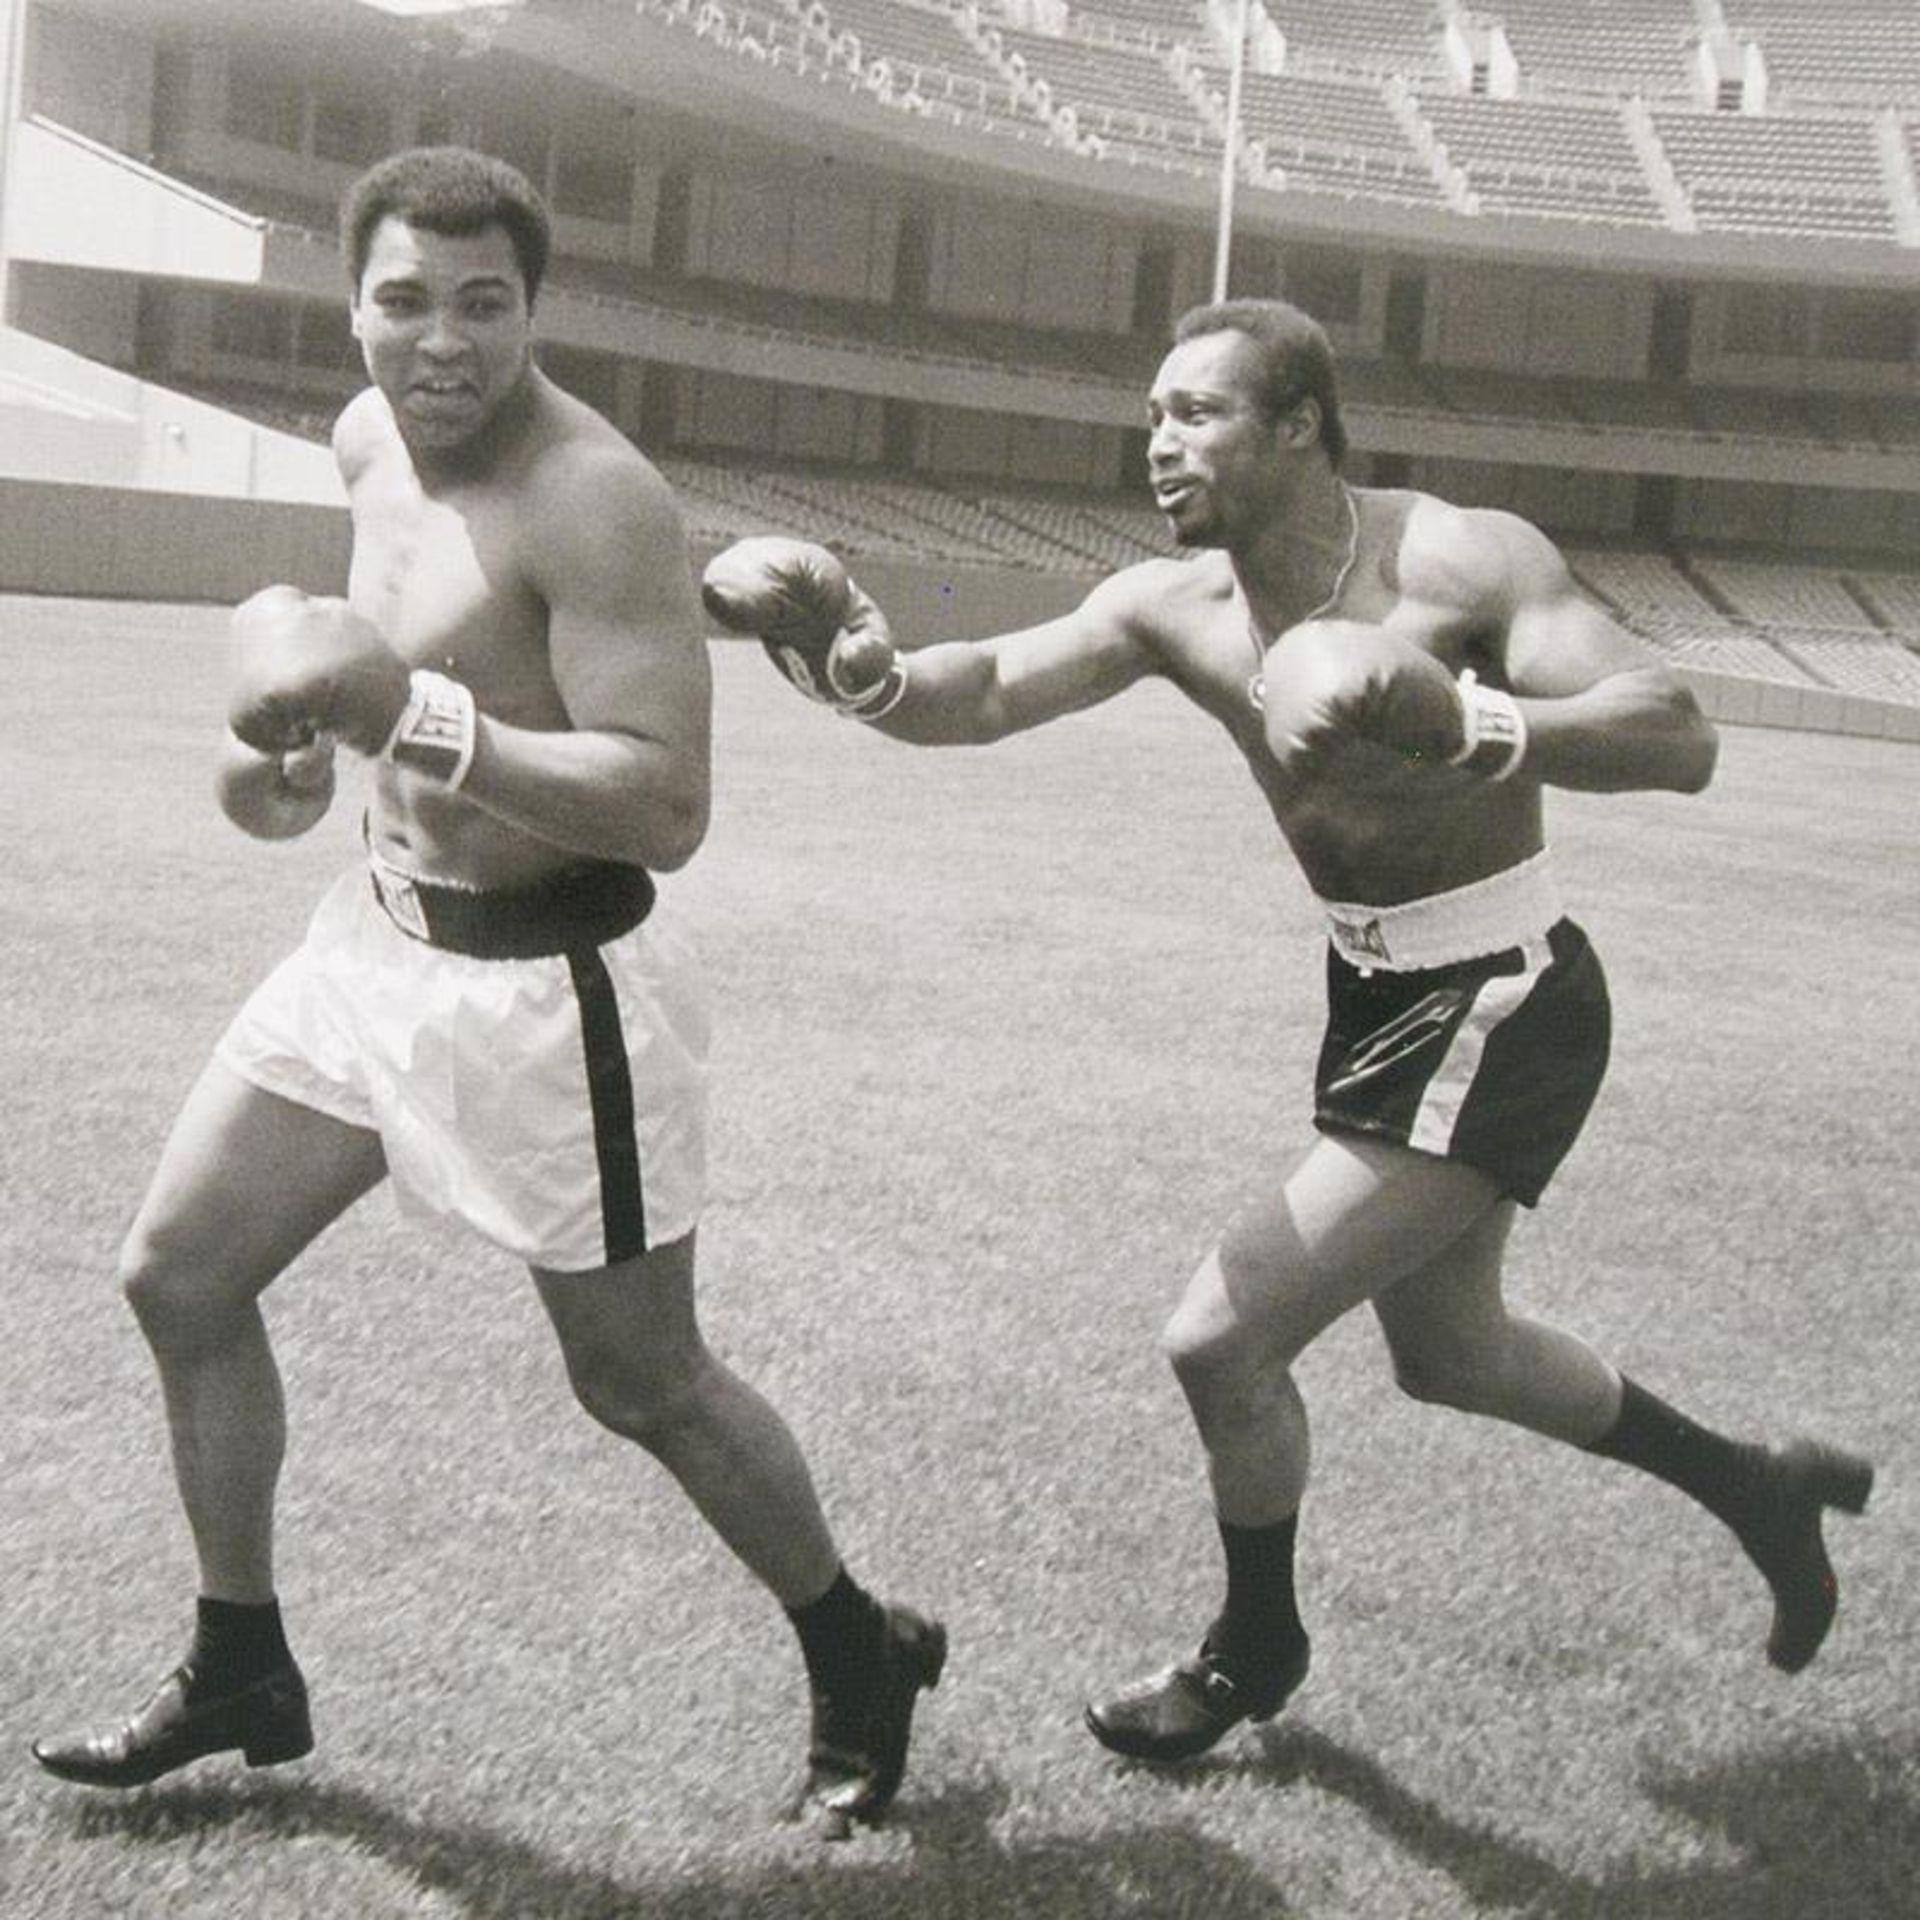 Norton Chasing Ali by Ali, Muhammad - Image 2 of 2